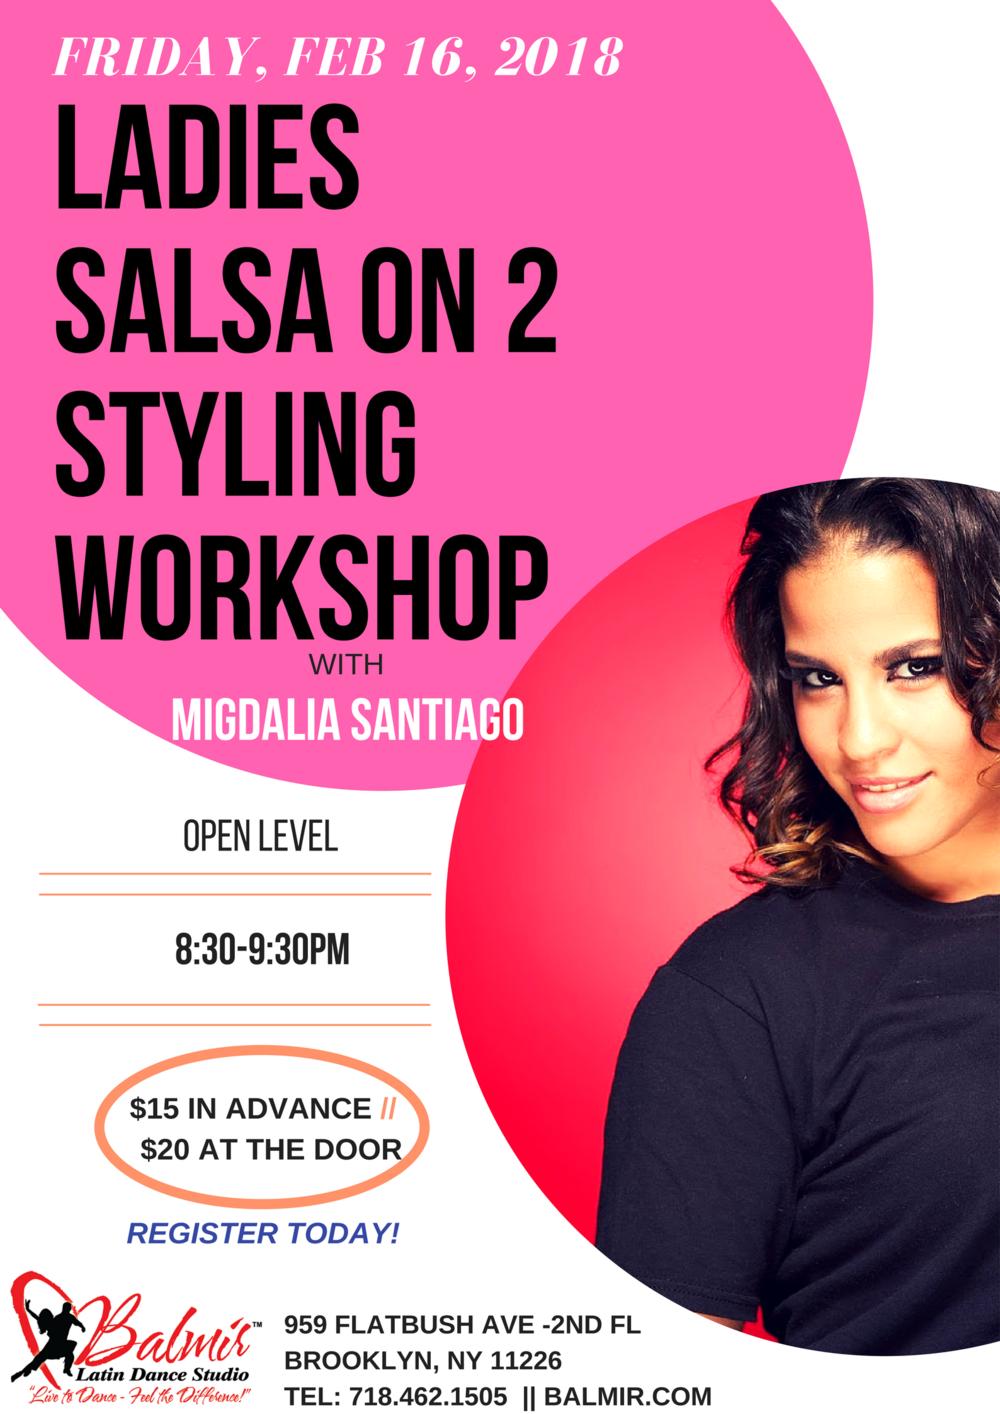 MONDAY, JAN 22, 2018 Ladies Salsa On 2 Styling Workshop at Balmir Latin Dance Studio